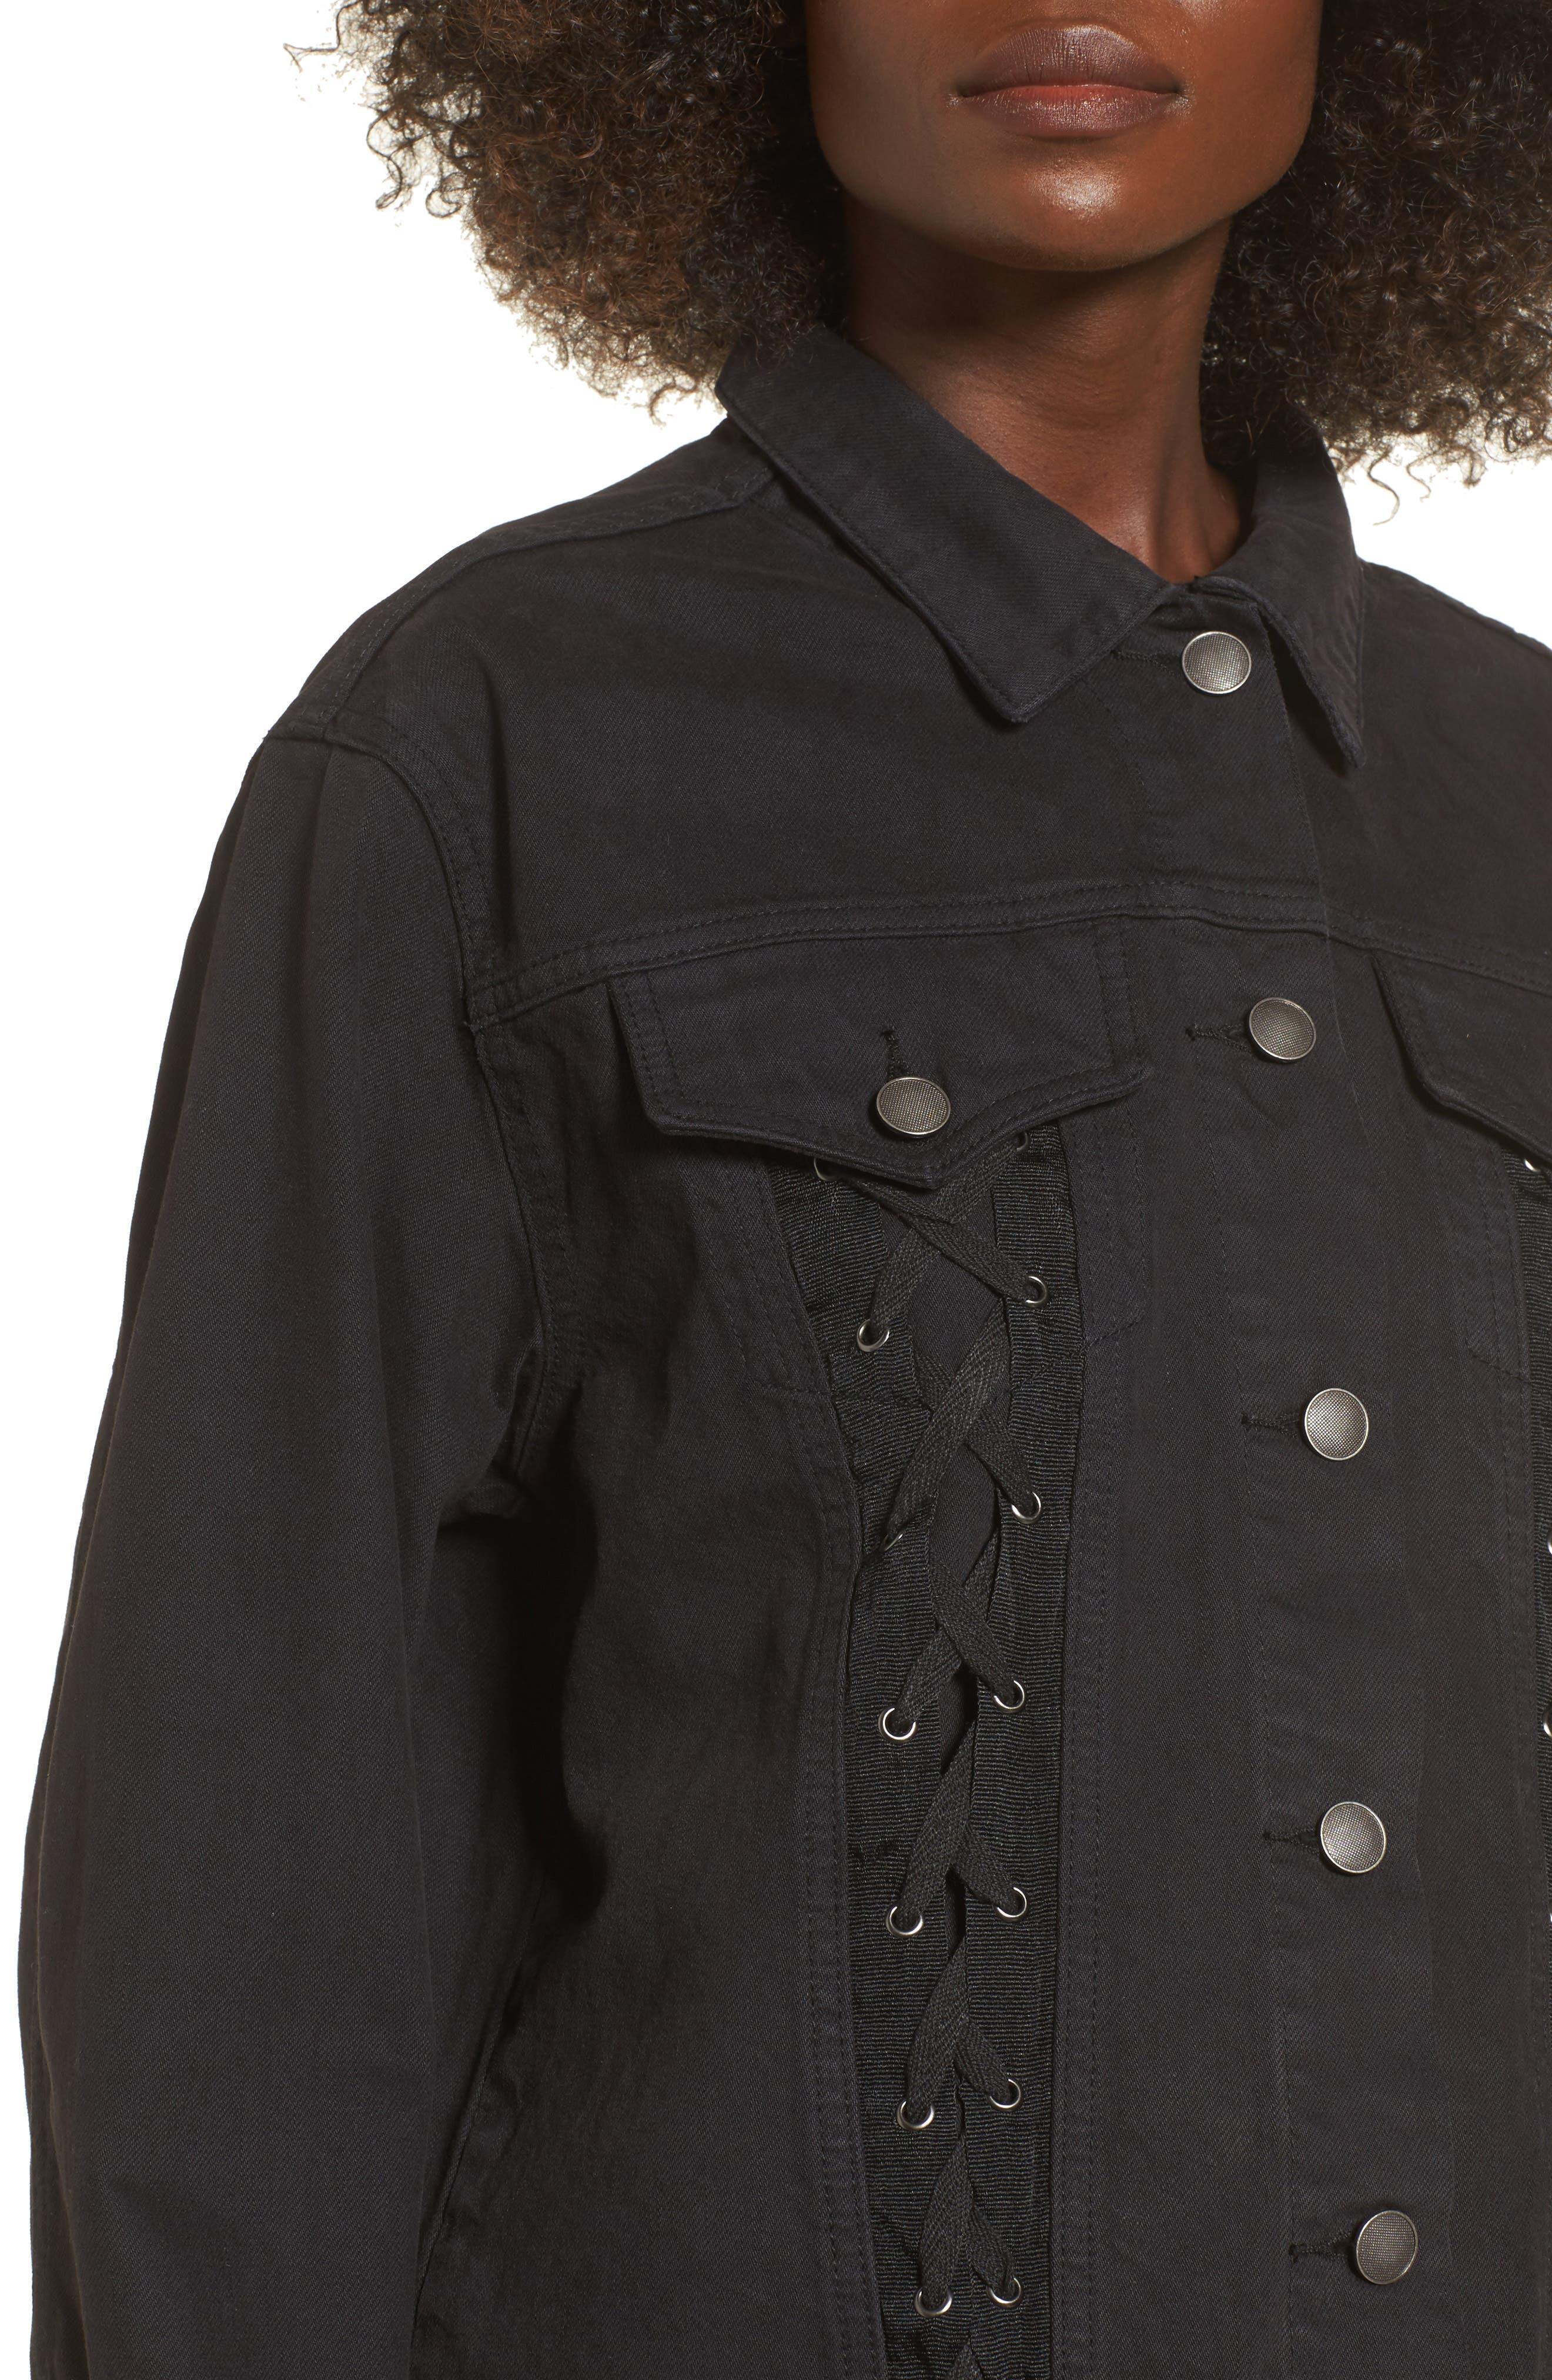 Lace-Up Denim Jacket,                             Alternate thumbnail 4, color,                             Black